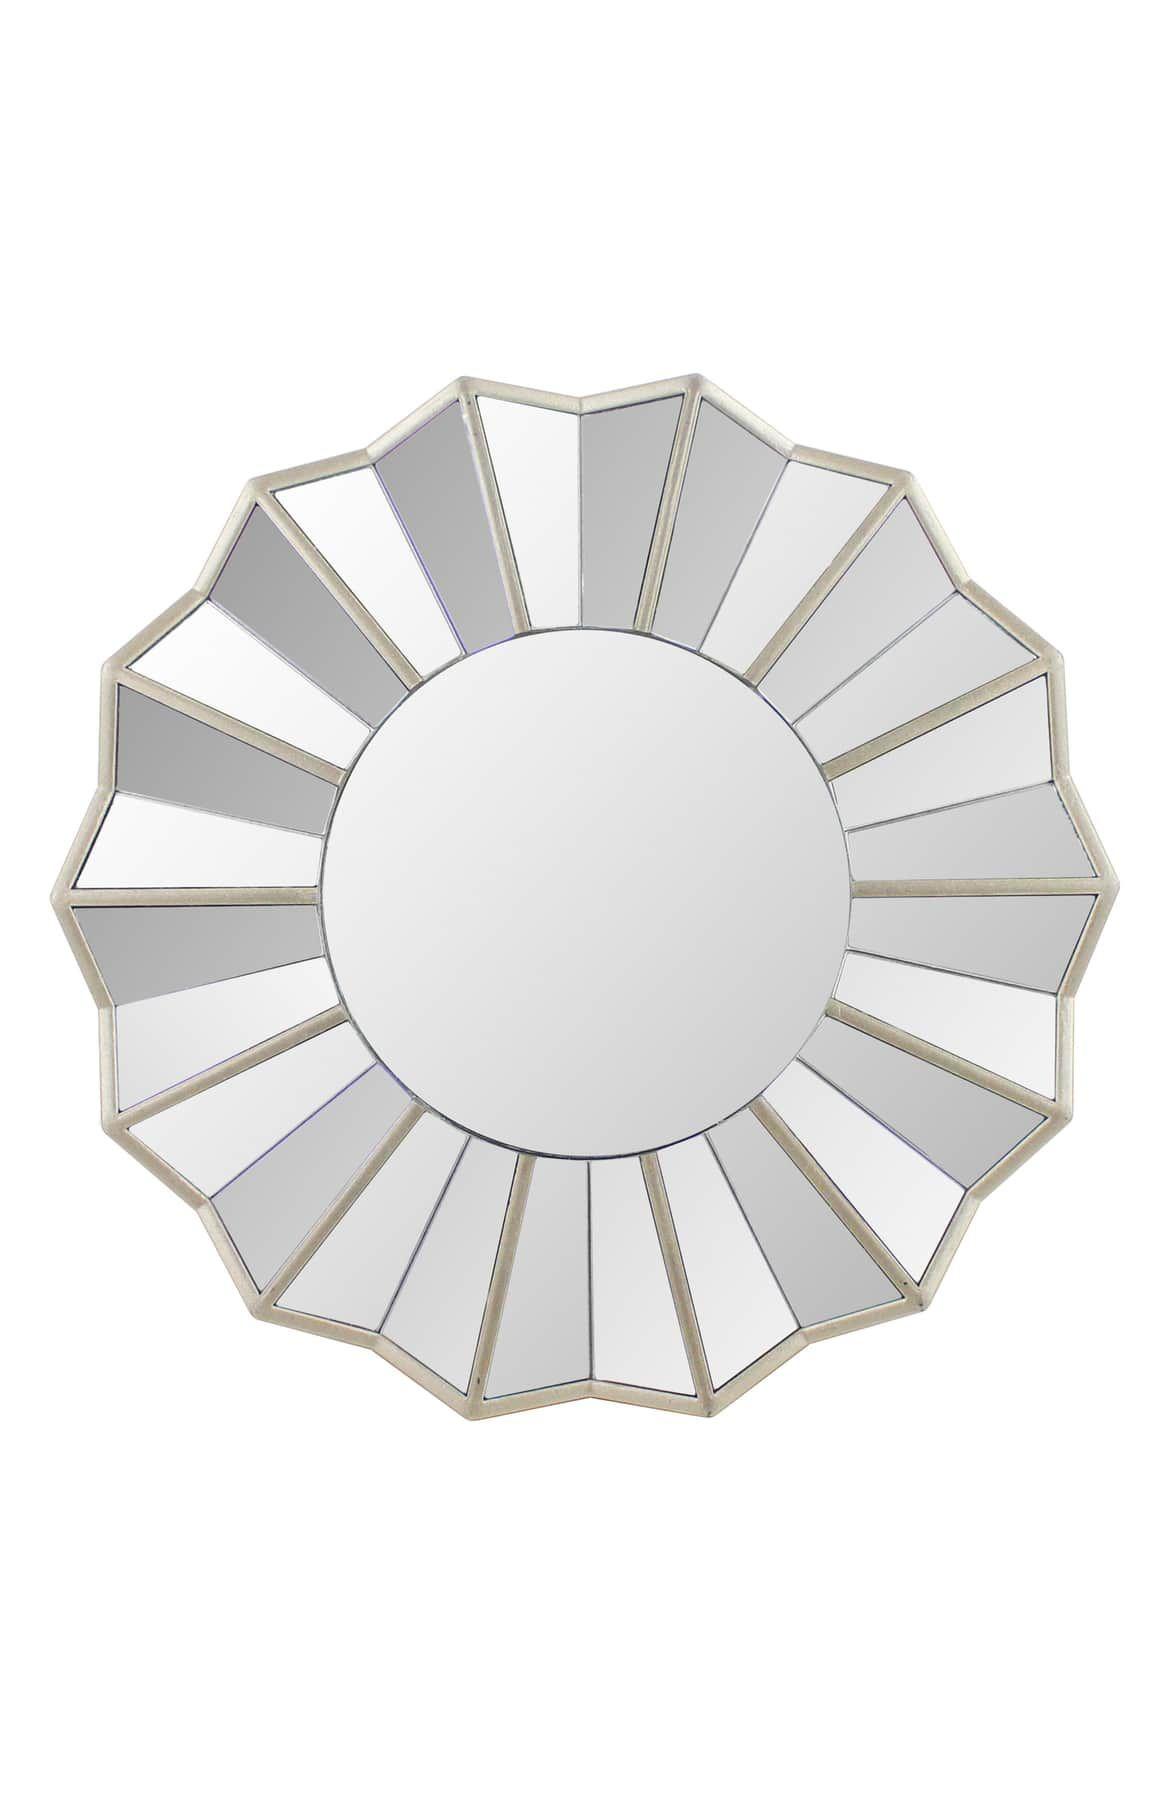 era home sunburst wall mirror mirror wall home depot on home depot paint sale id=56144